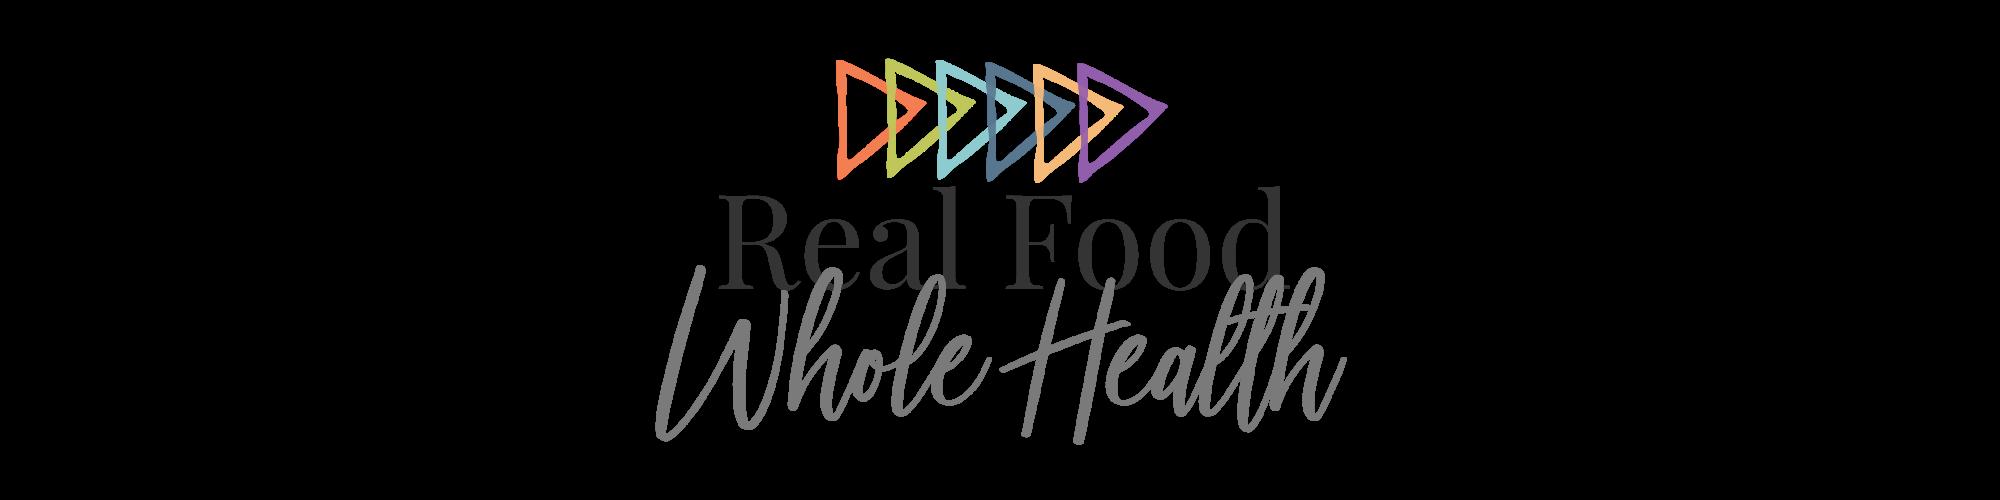 Real Food Whole Health